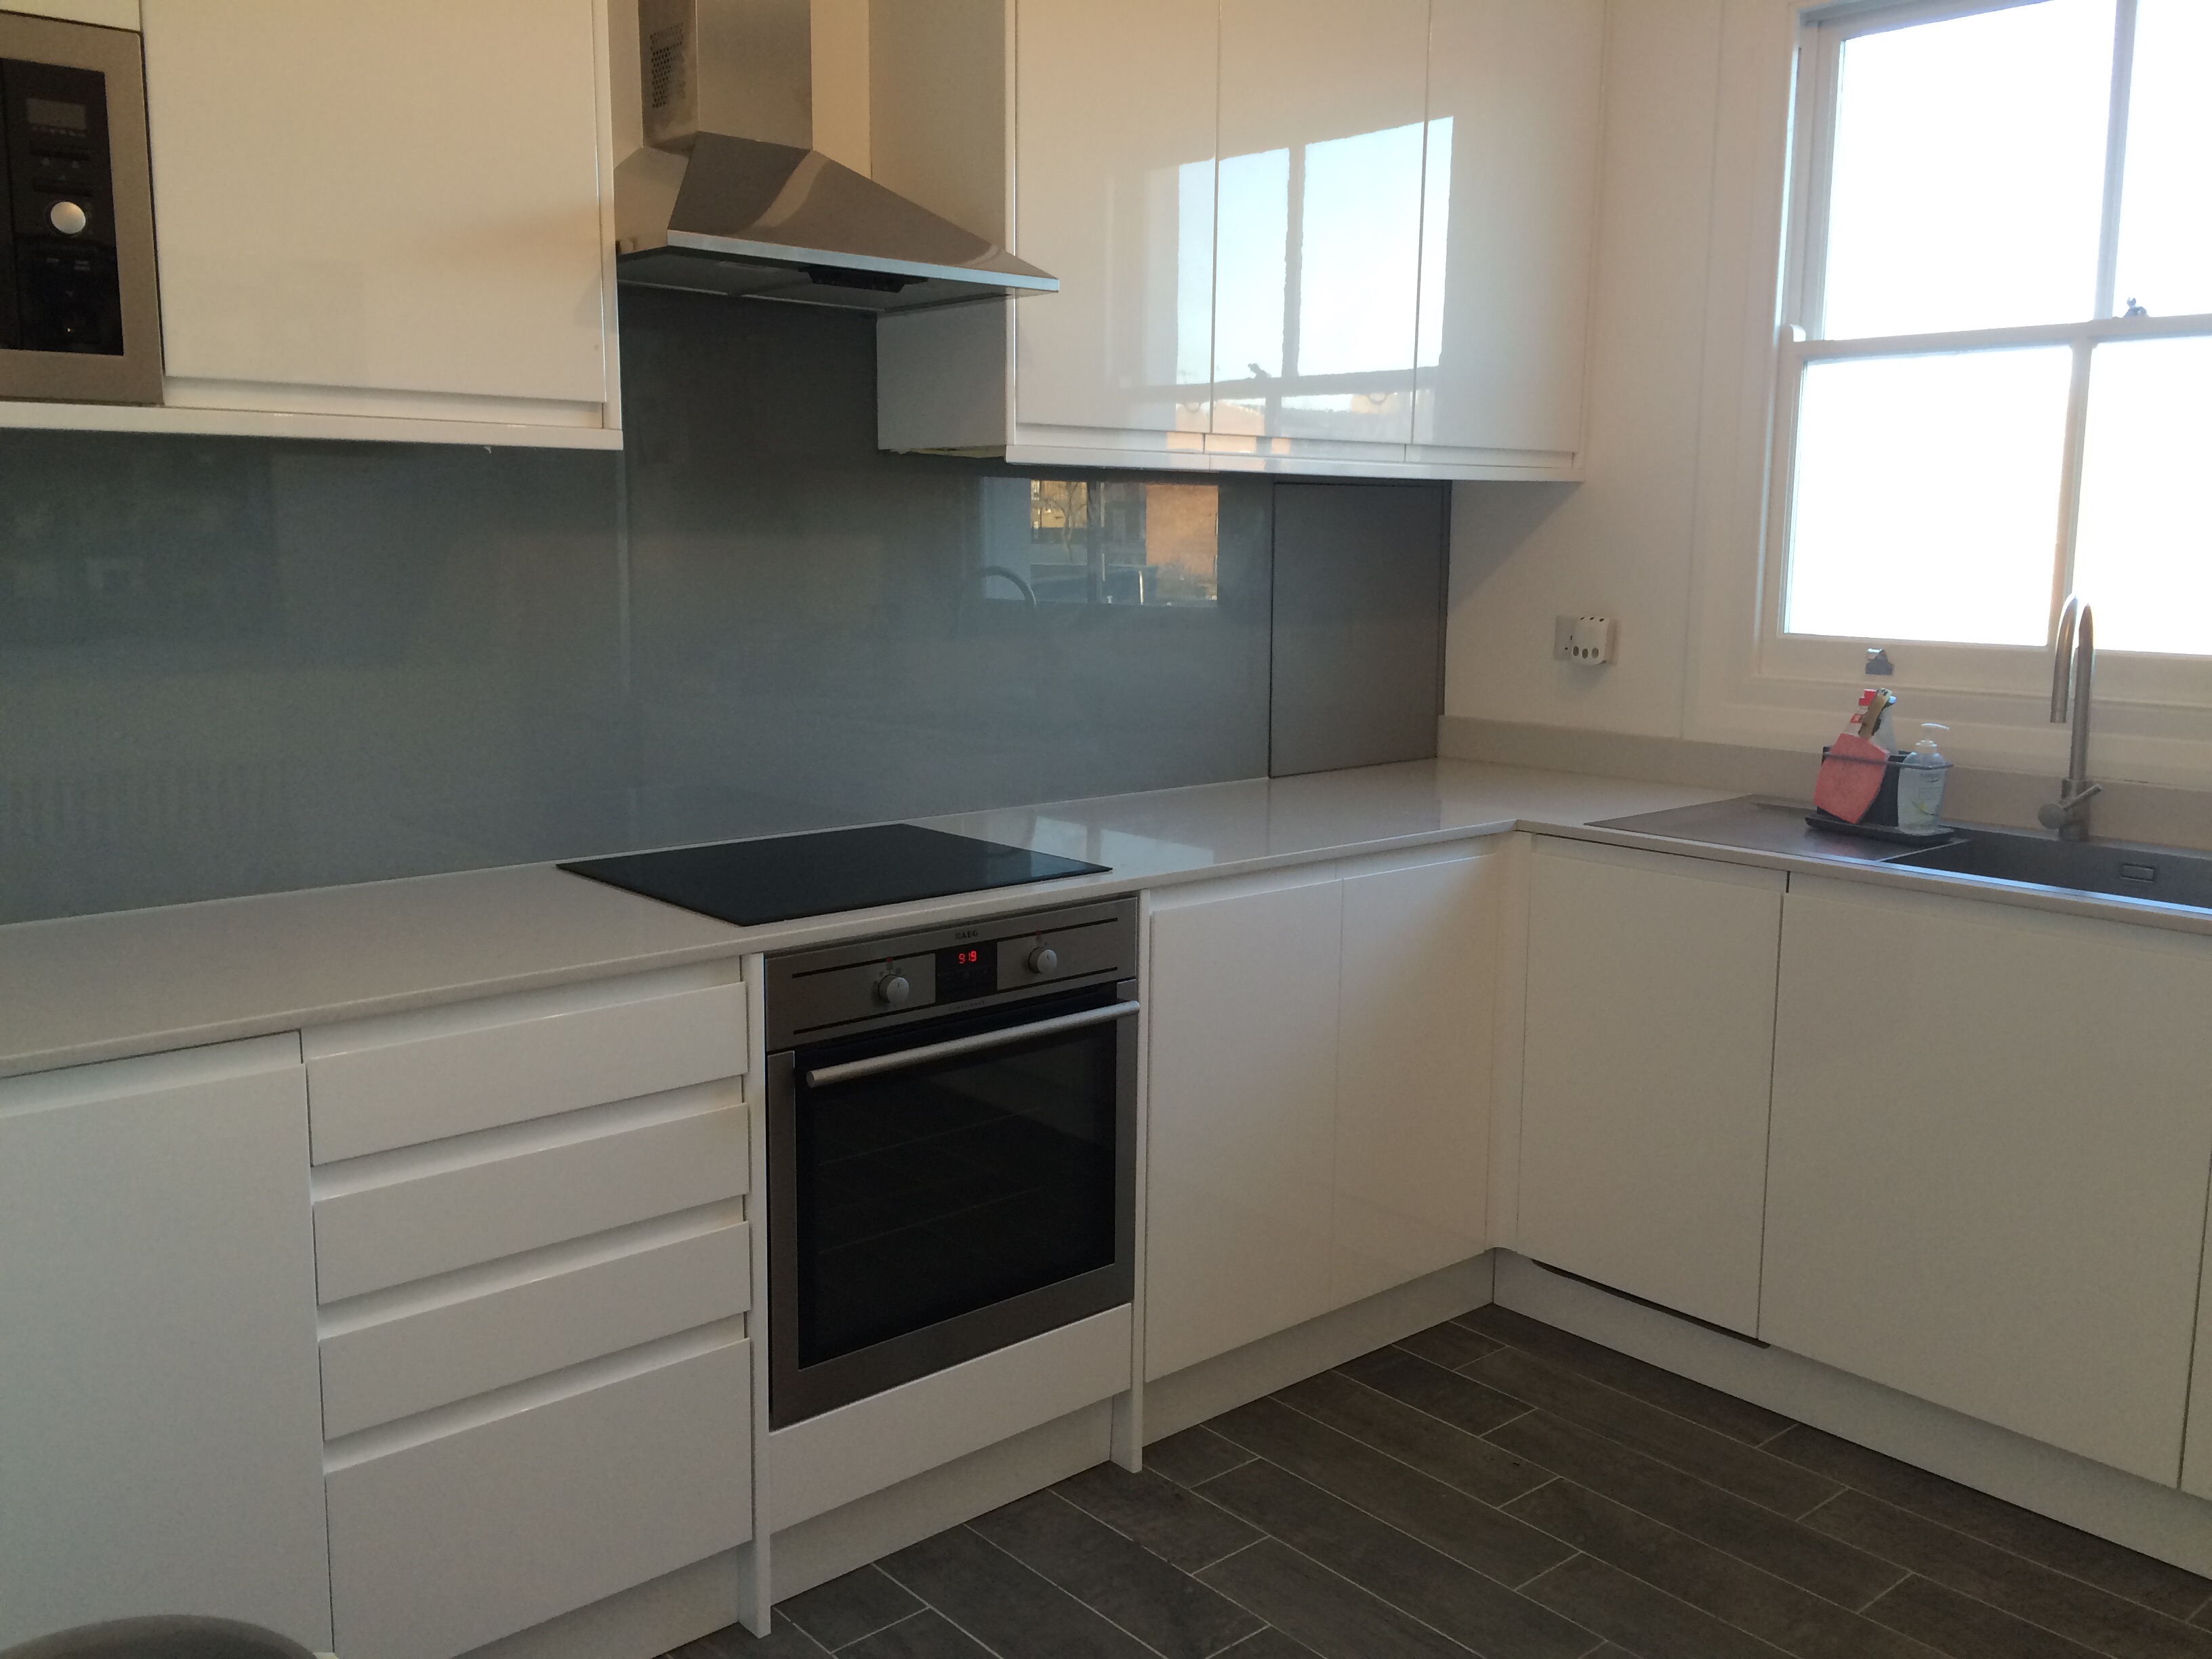 Marble look quartz kitchen wokrtop in N1 London and glass splashback(3)